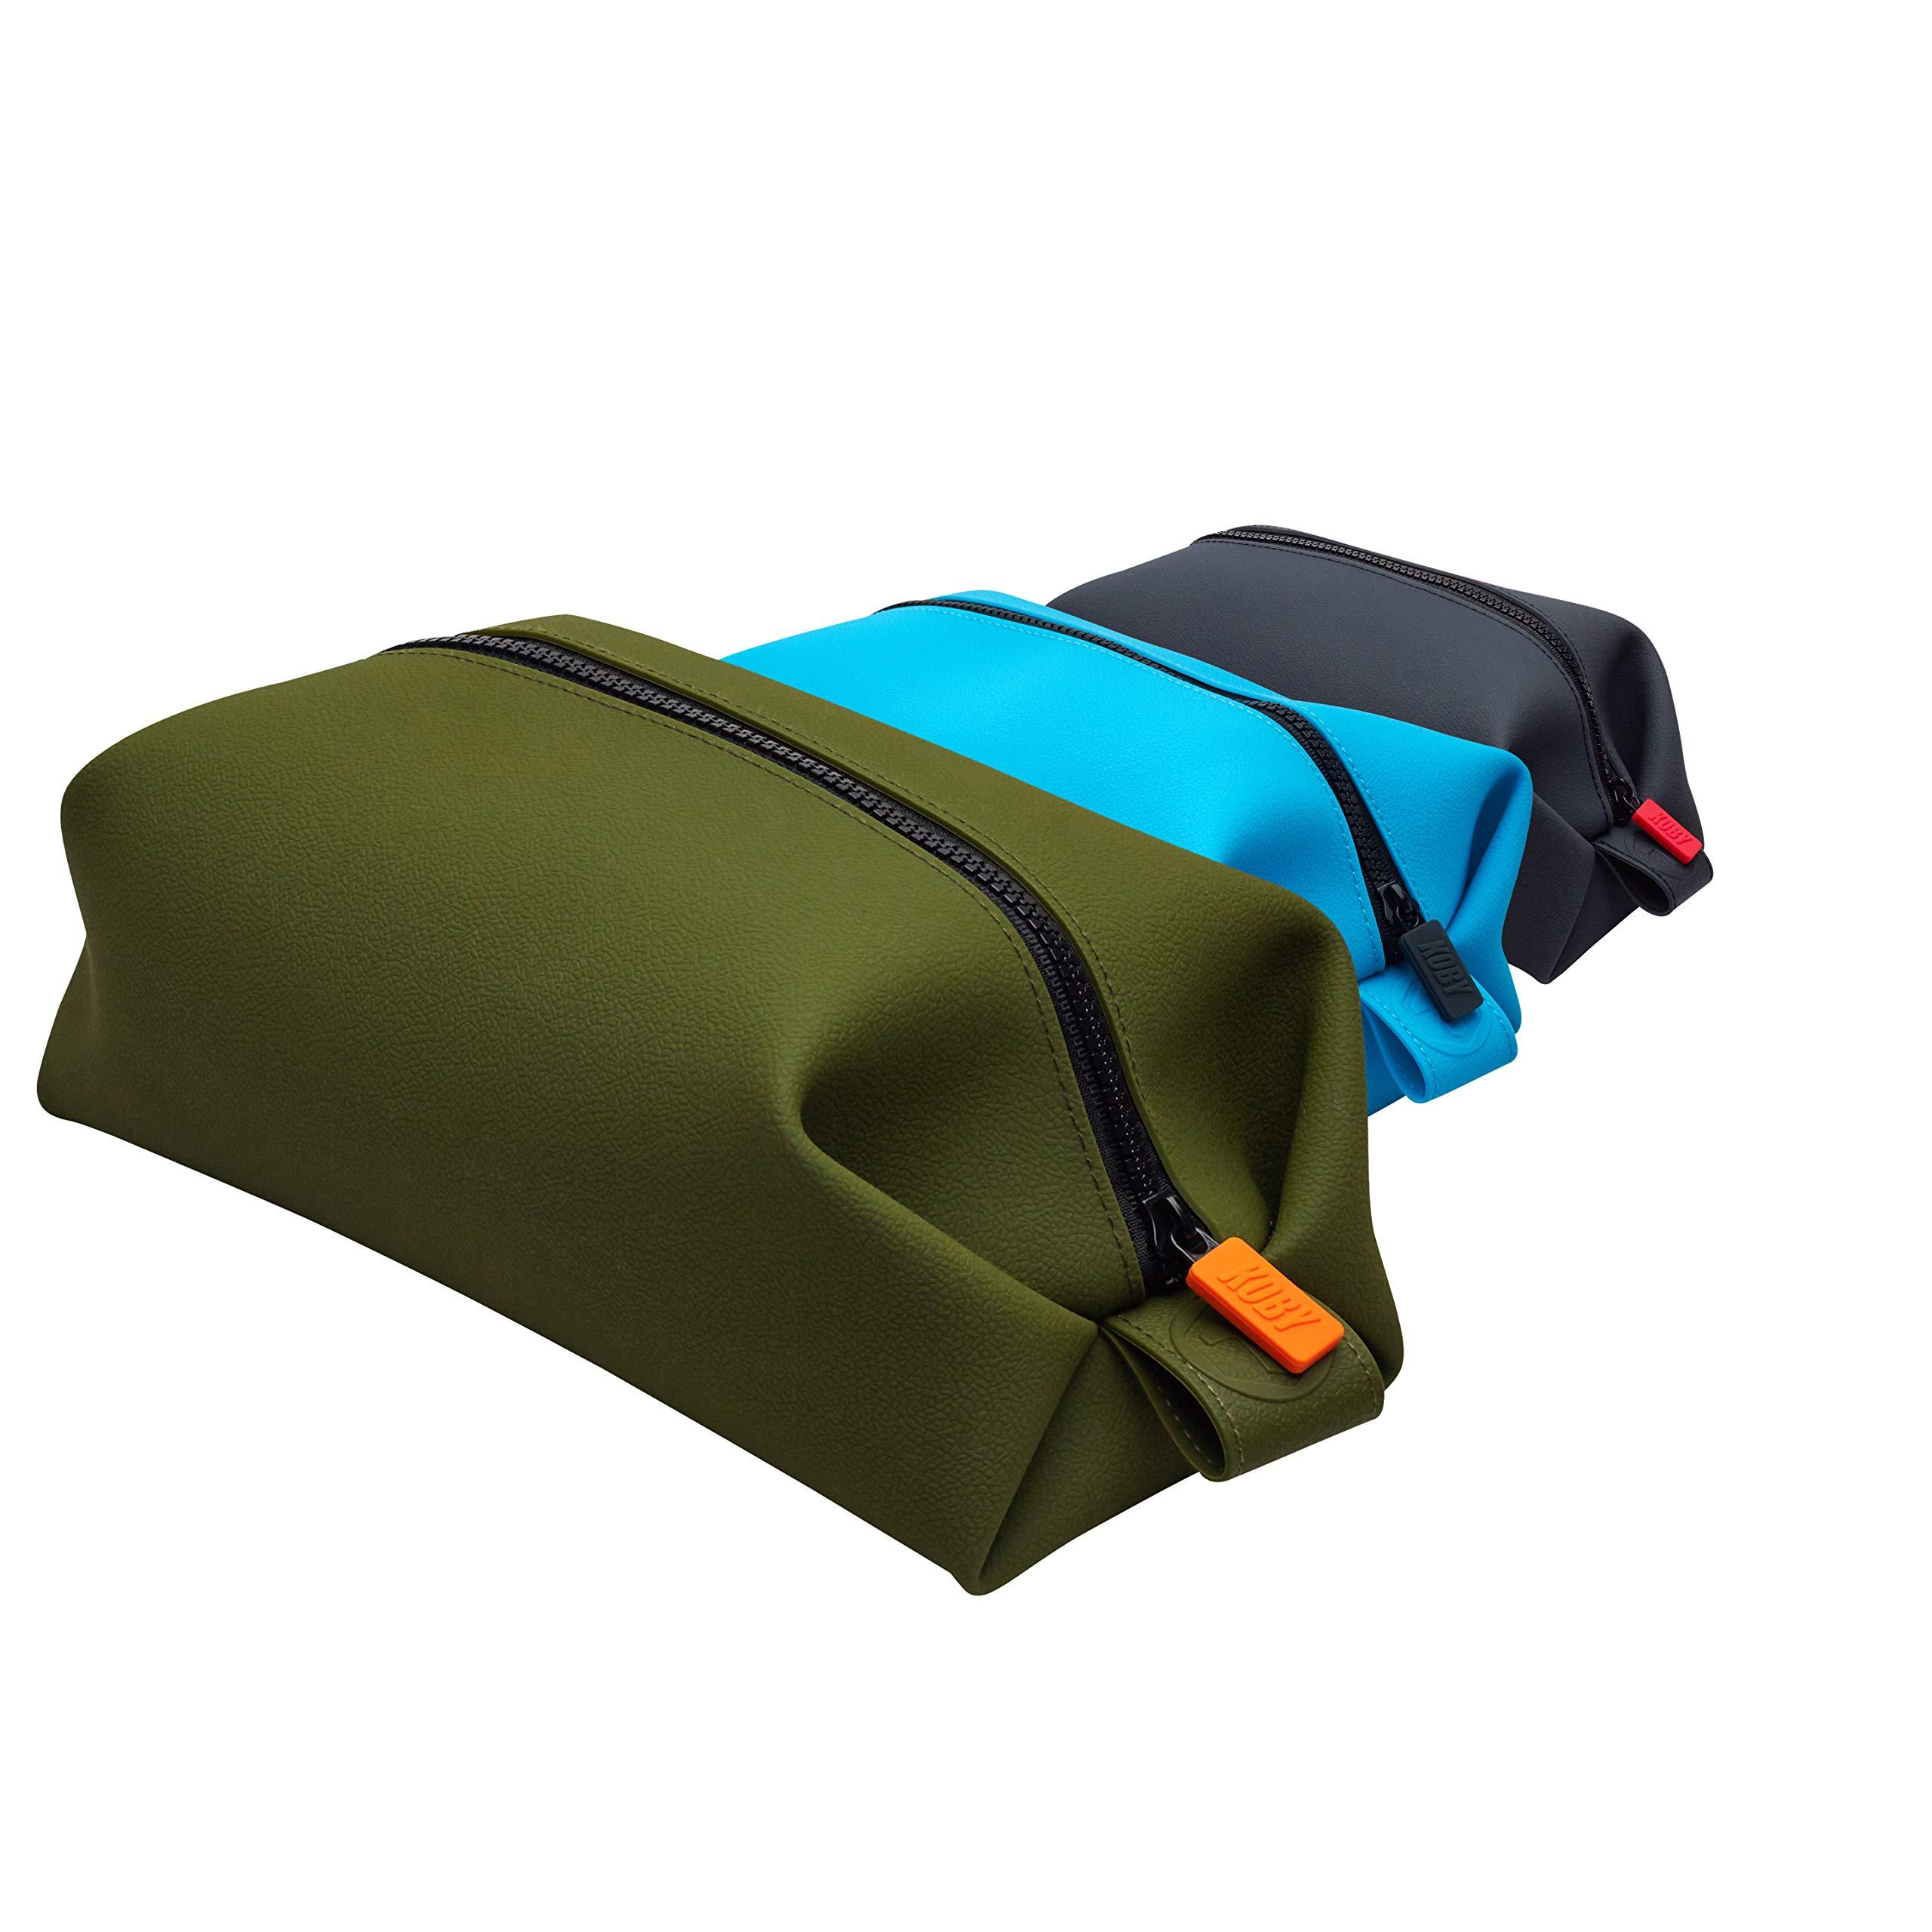 cd887aa9654b Amazon.com  Tooletries - The Koby Bag (Charcoal)